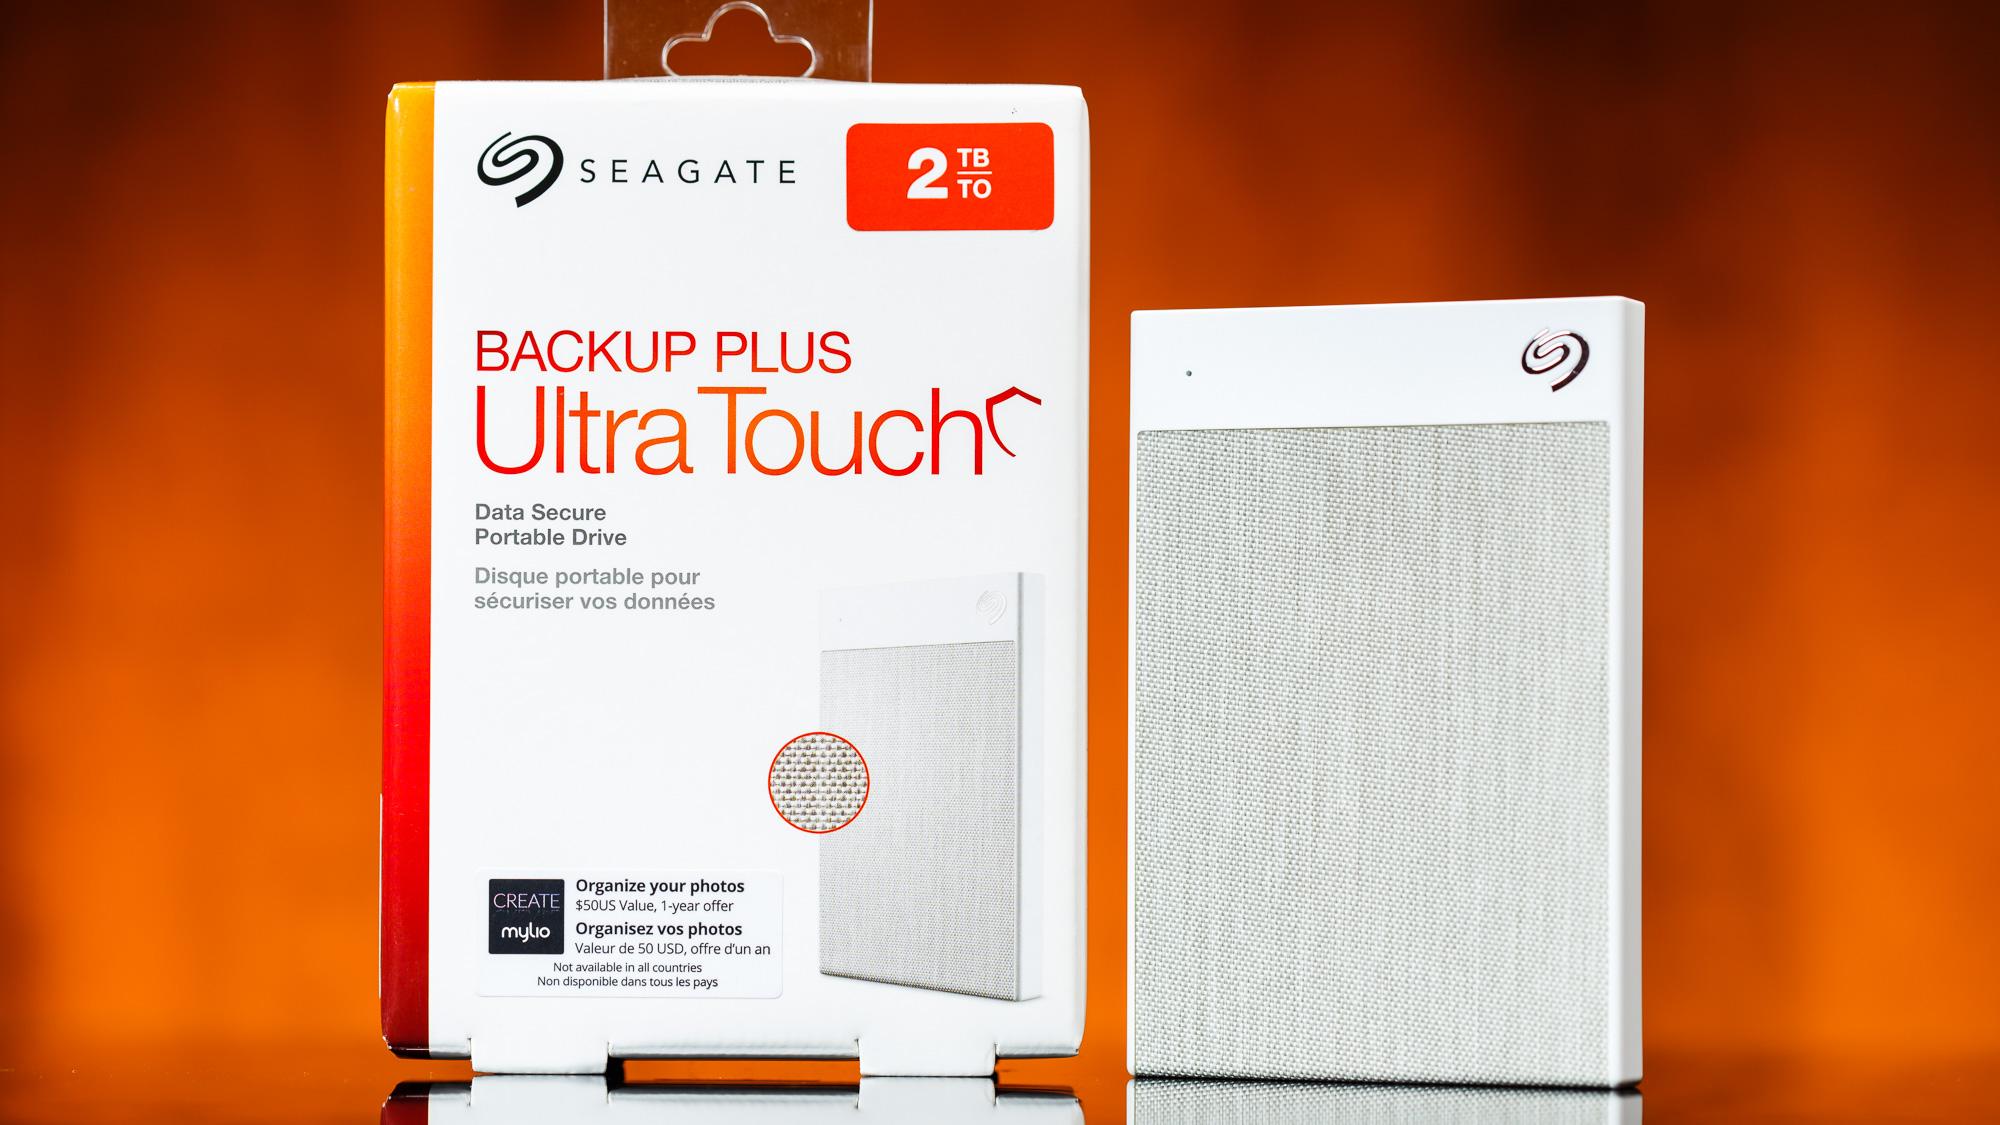 Unidad de disco duro portátil Seagate Backup Plus Ultra Touch (Crédito: Tom